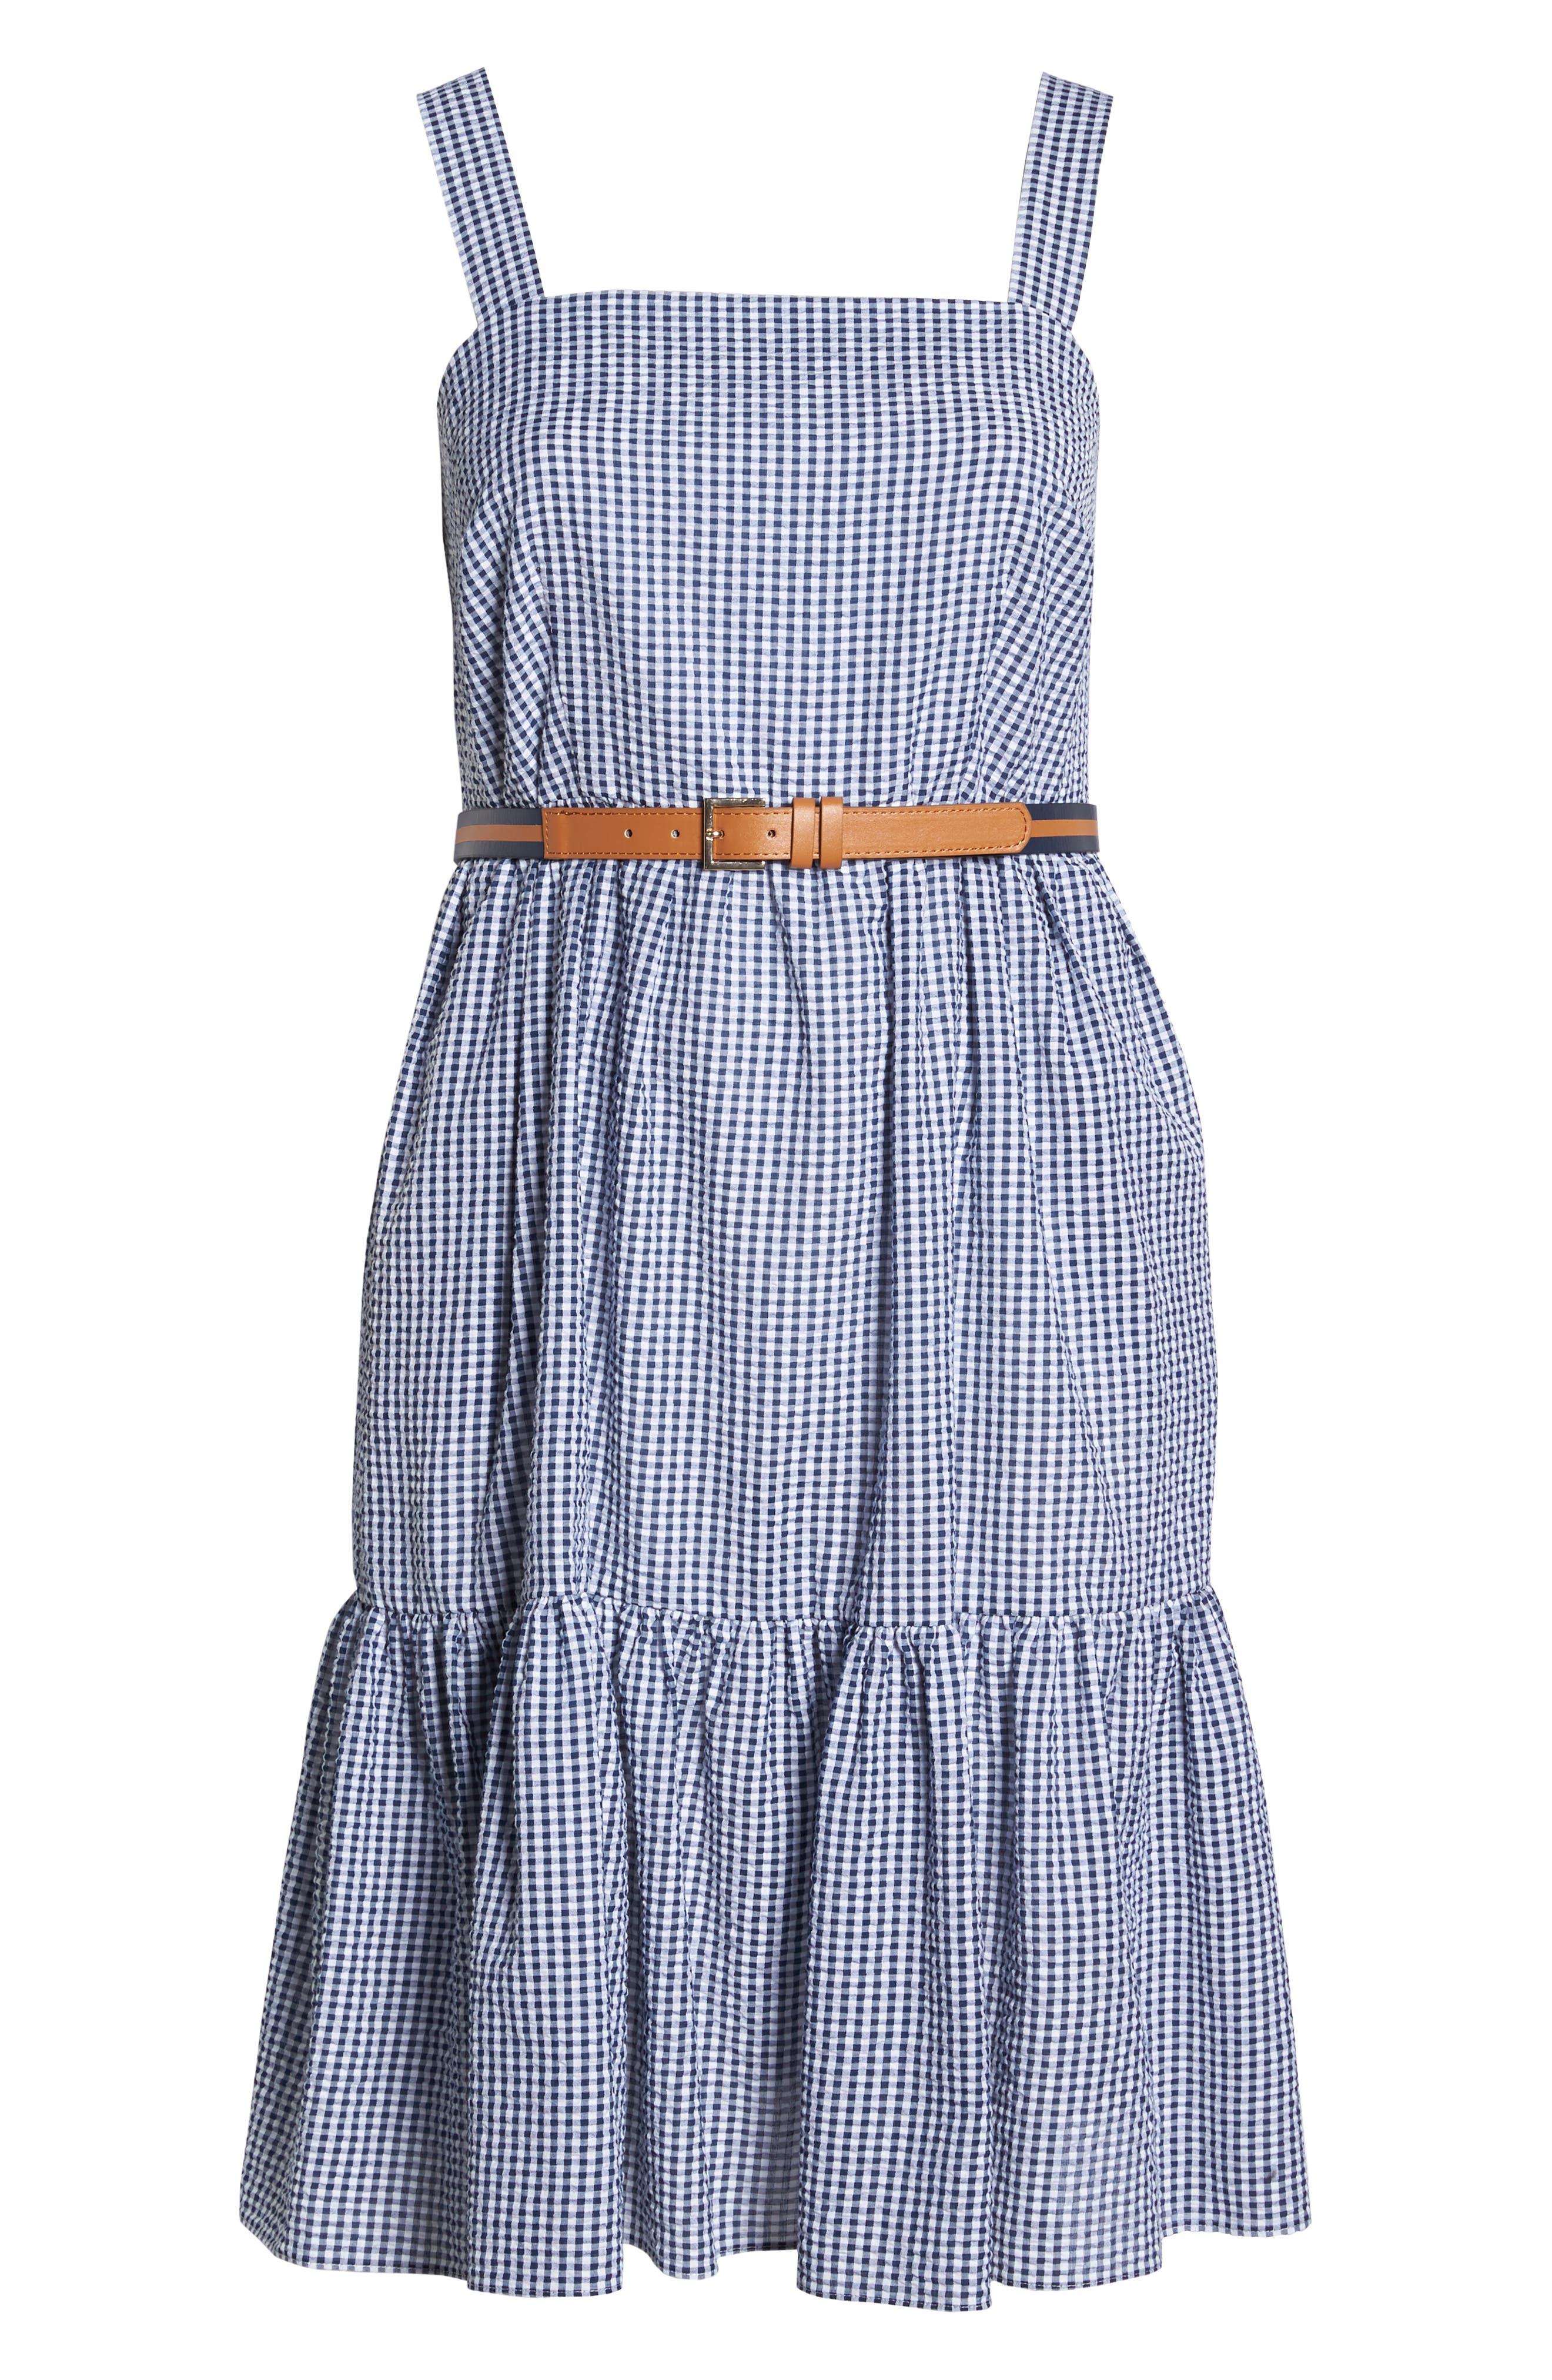 Belted Gingham Seersucker Fit & Flare Dress,                             Alternate thumbnail 7, color,                             410